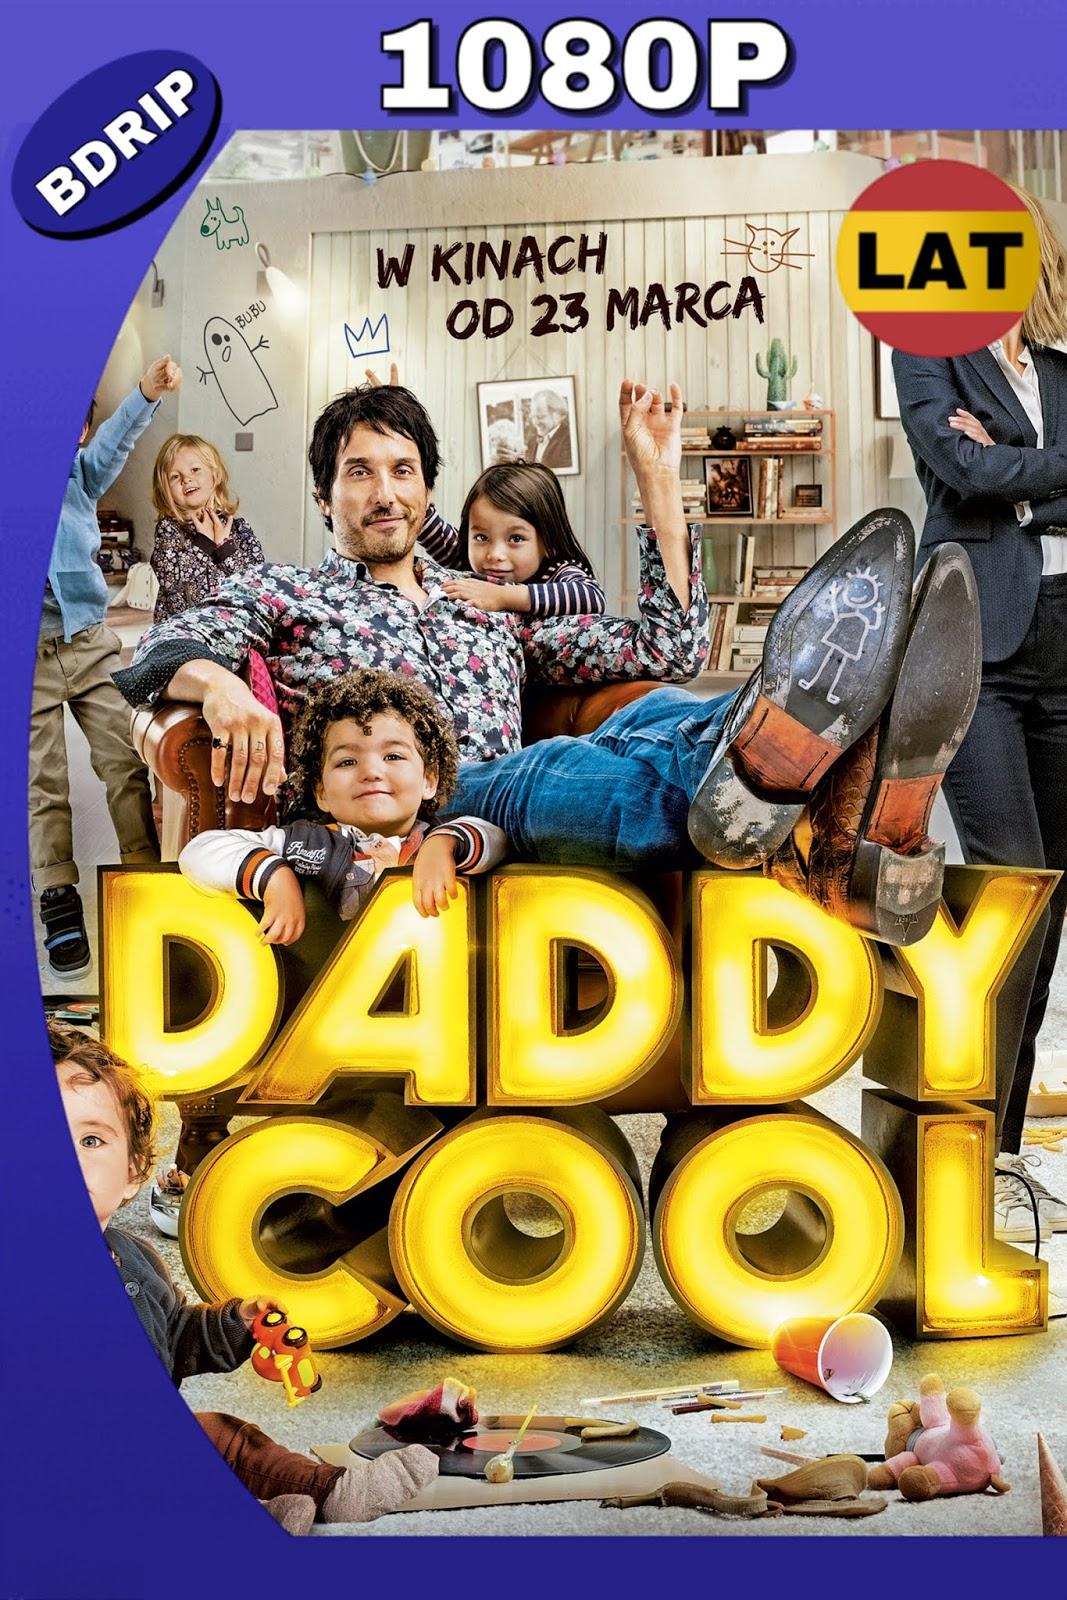 DADDY COOL 2017 LAT-FRA HD BDRIP 1080P MKV